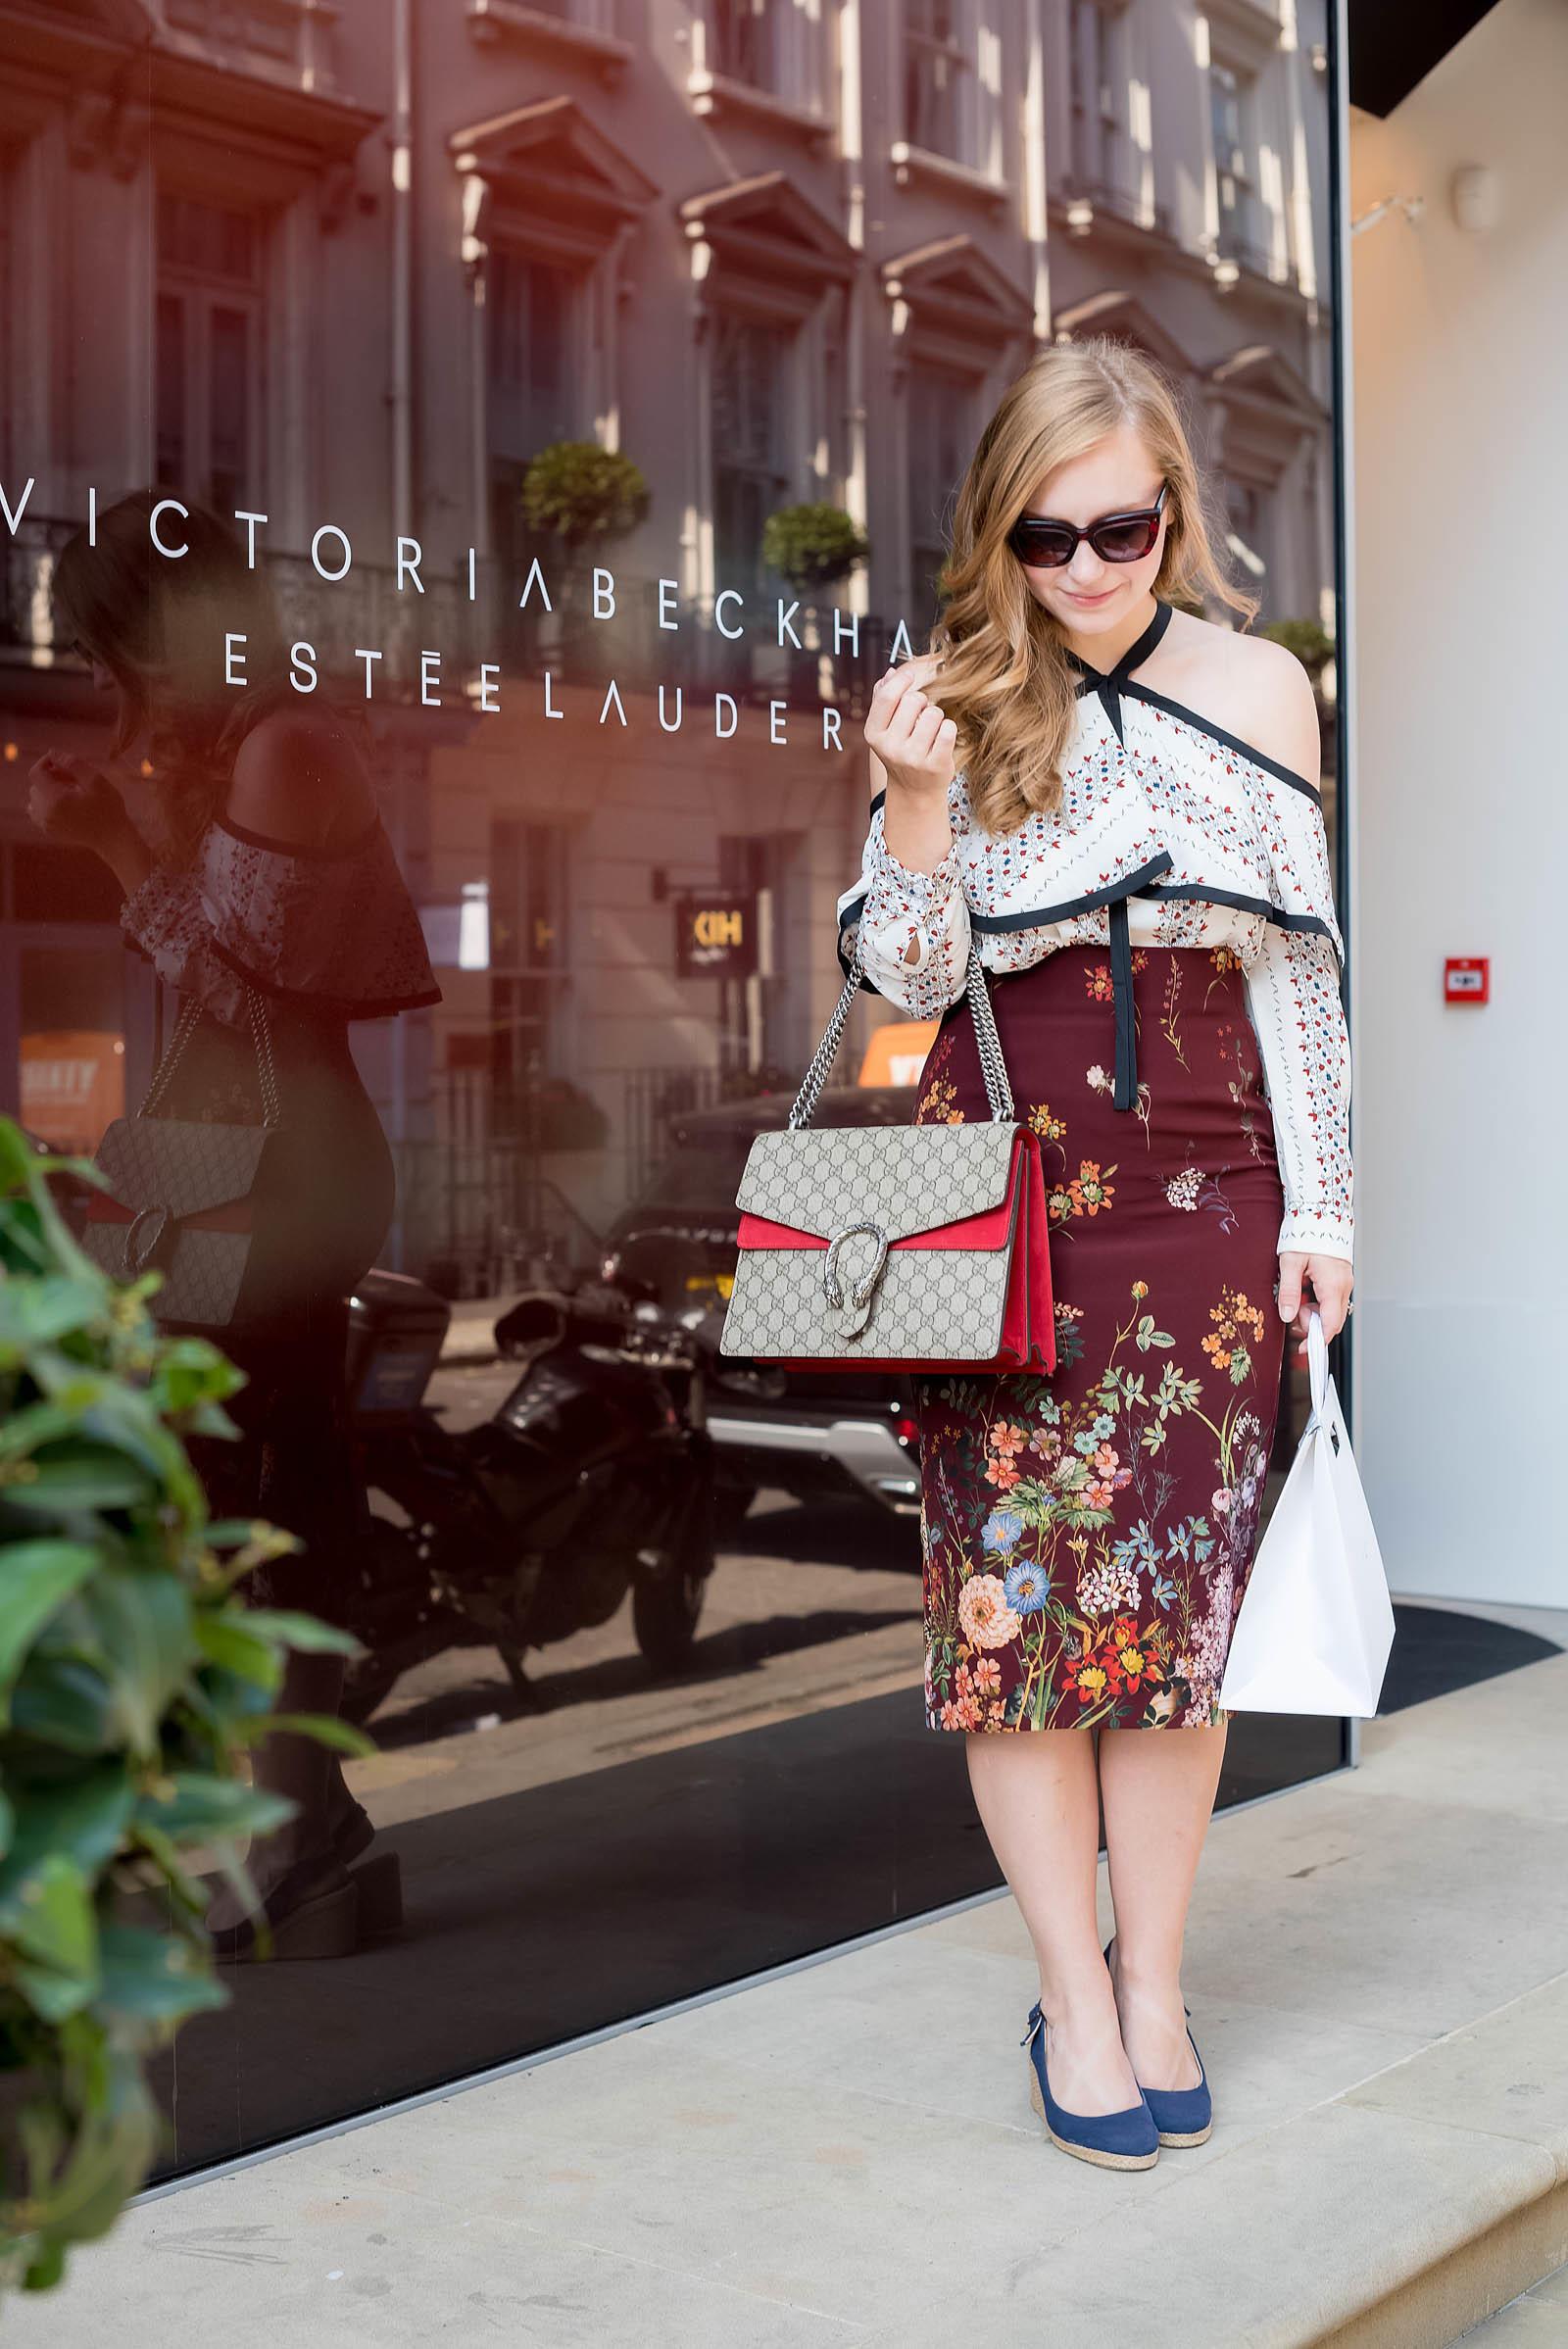 Victoria Beckham London Dover St Store